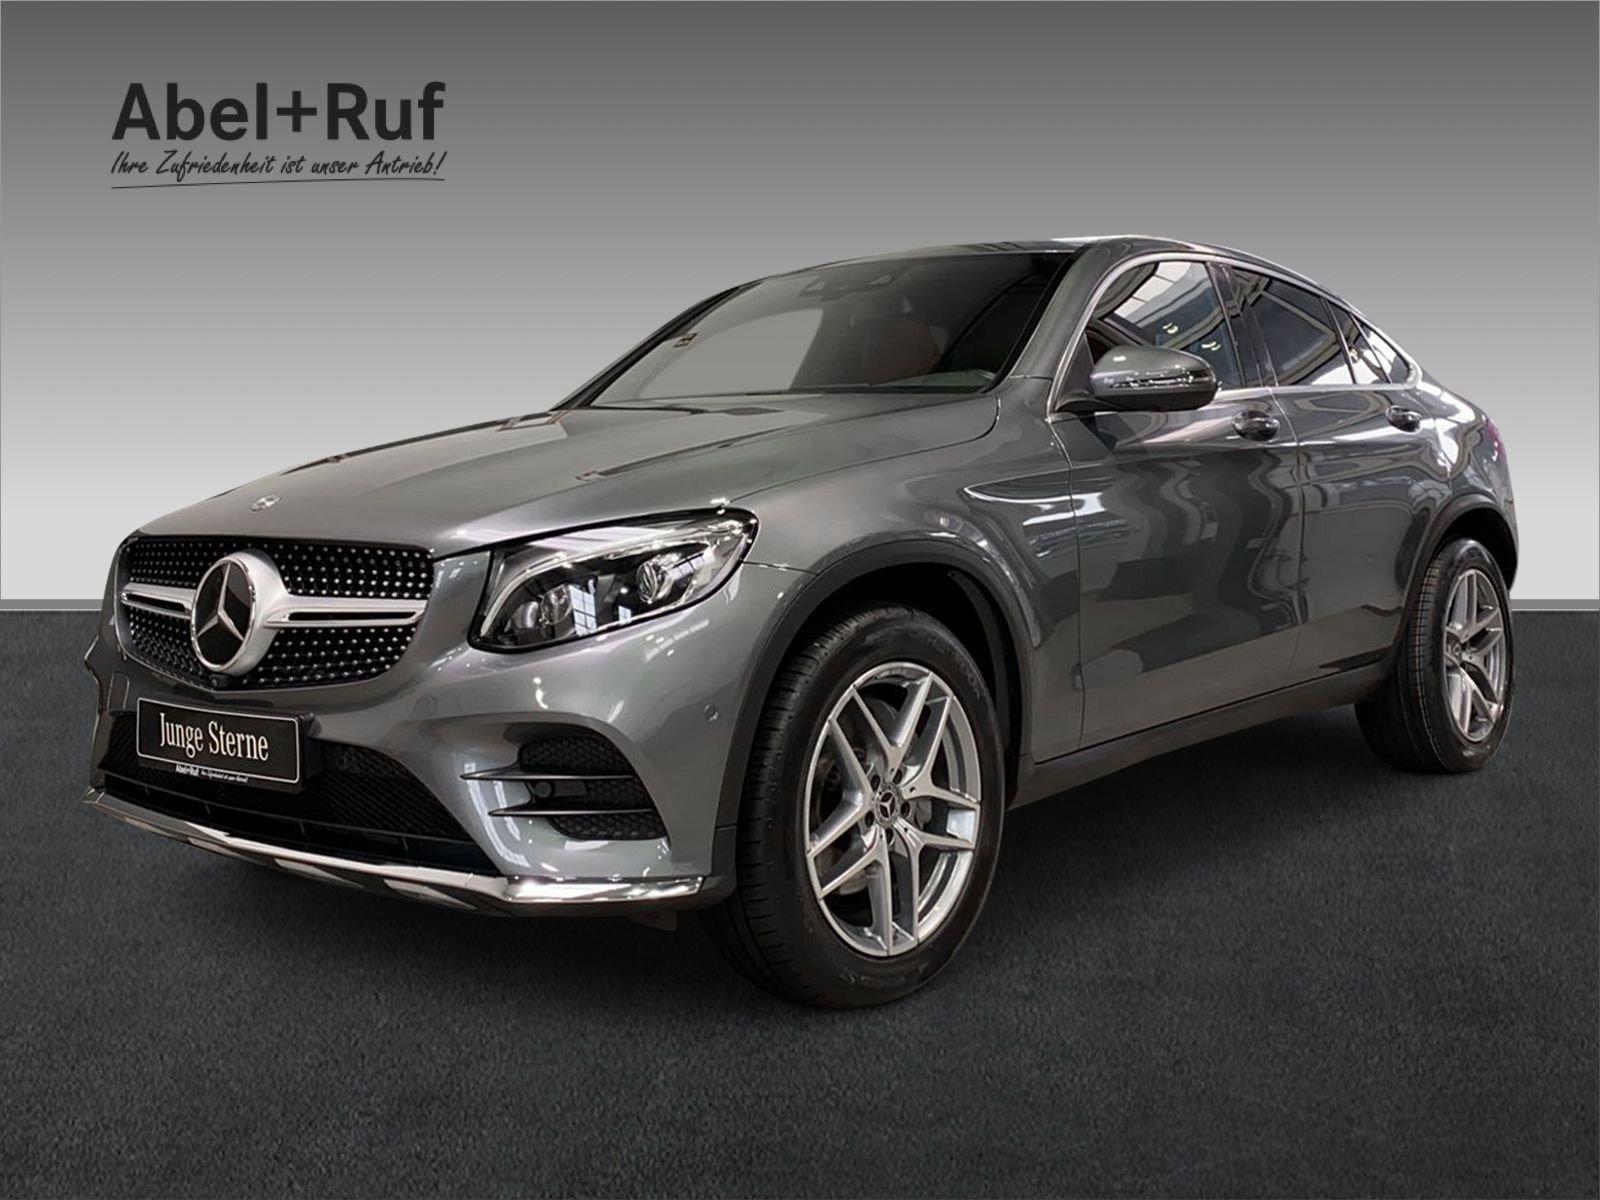 Mercedes-Benz GLC 300 C 4M+AMG+DISTRONIC+Navi+SHZ+SHD+LED+360°, Jahr 2017, Benzin